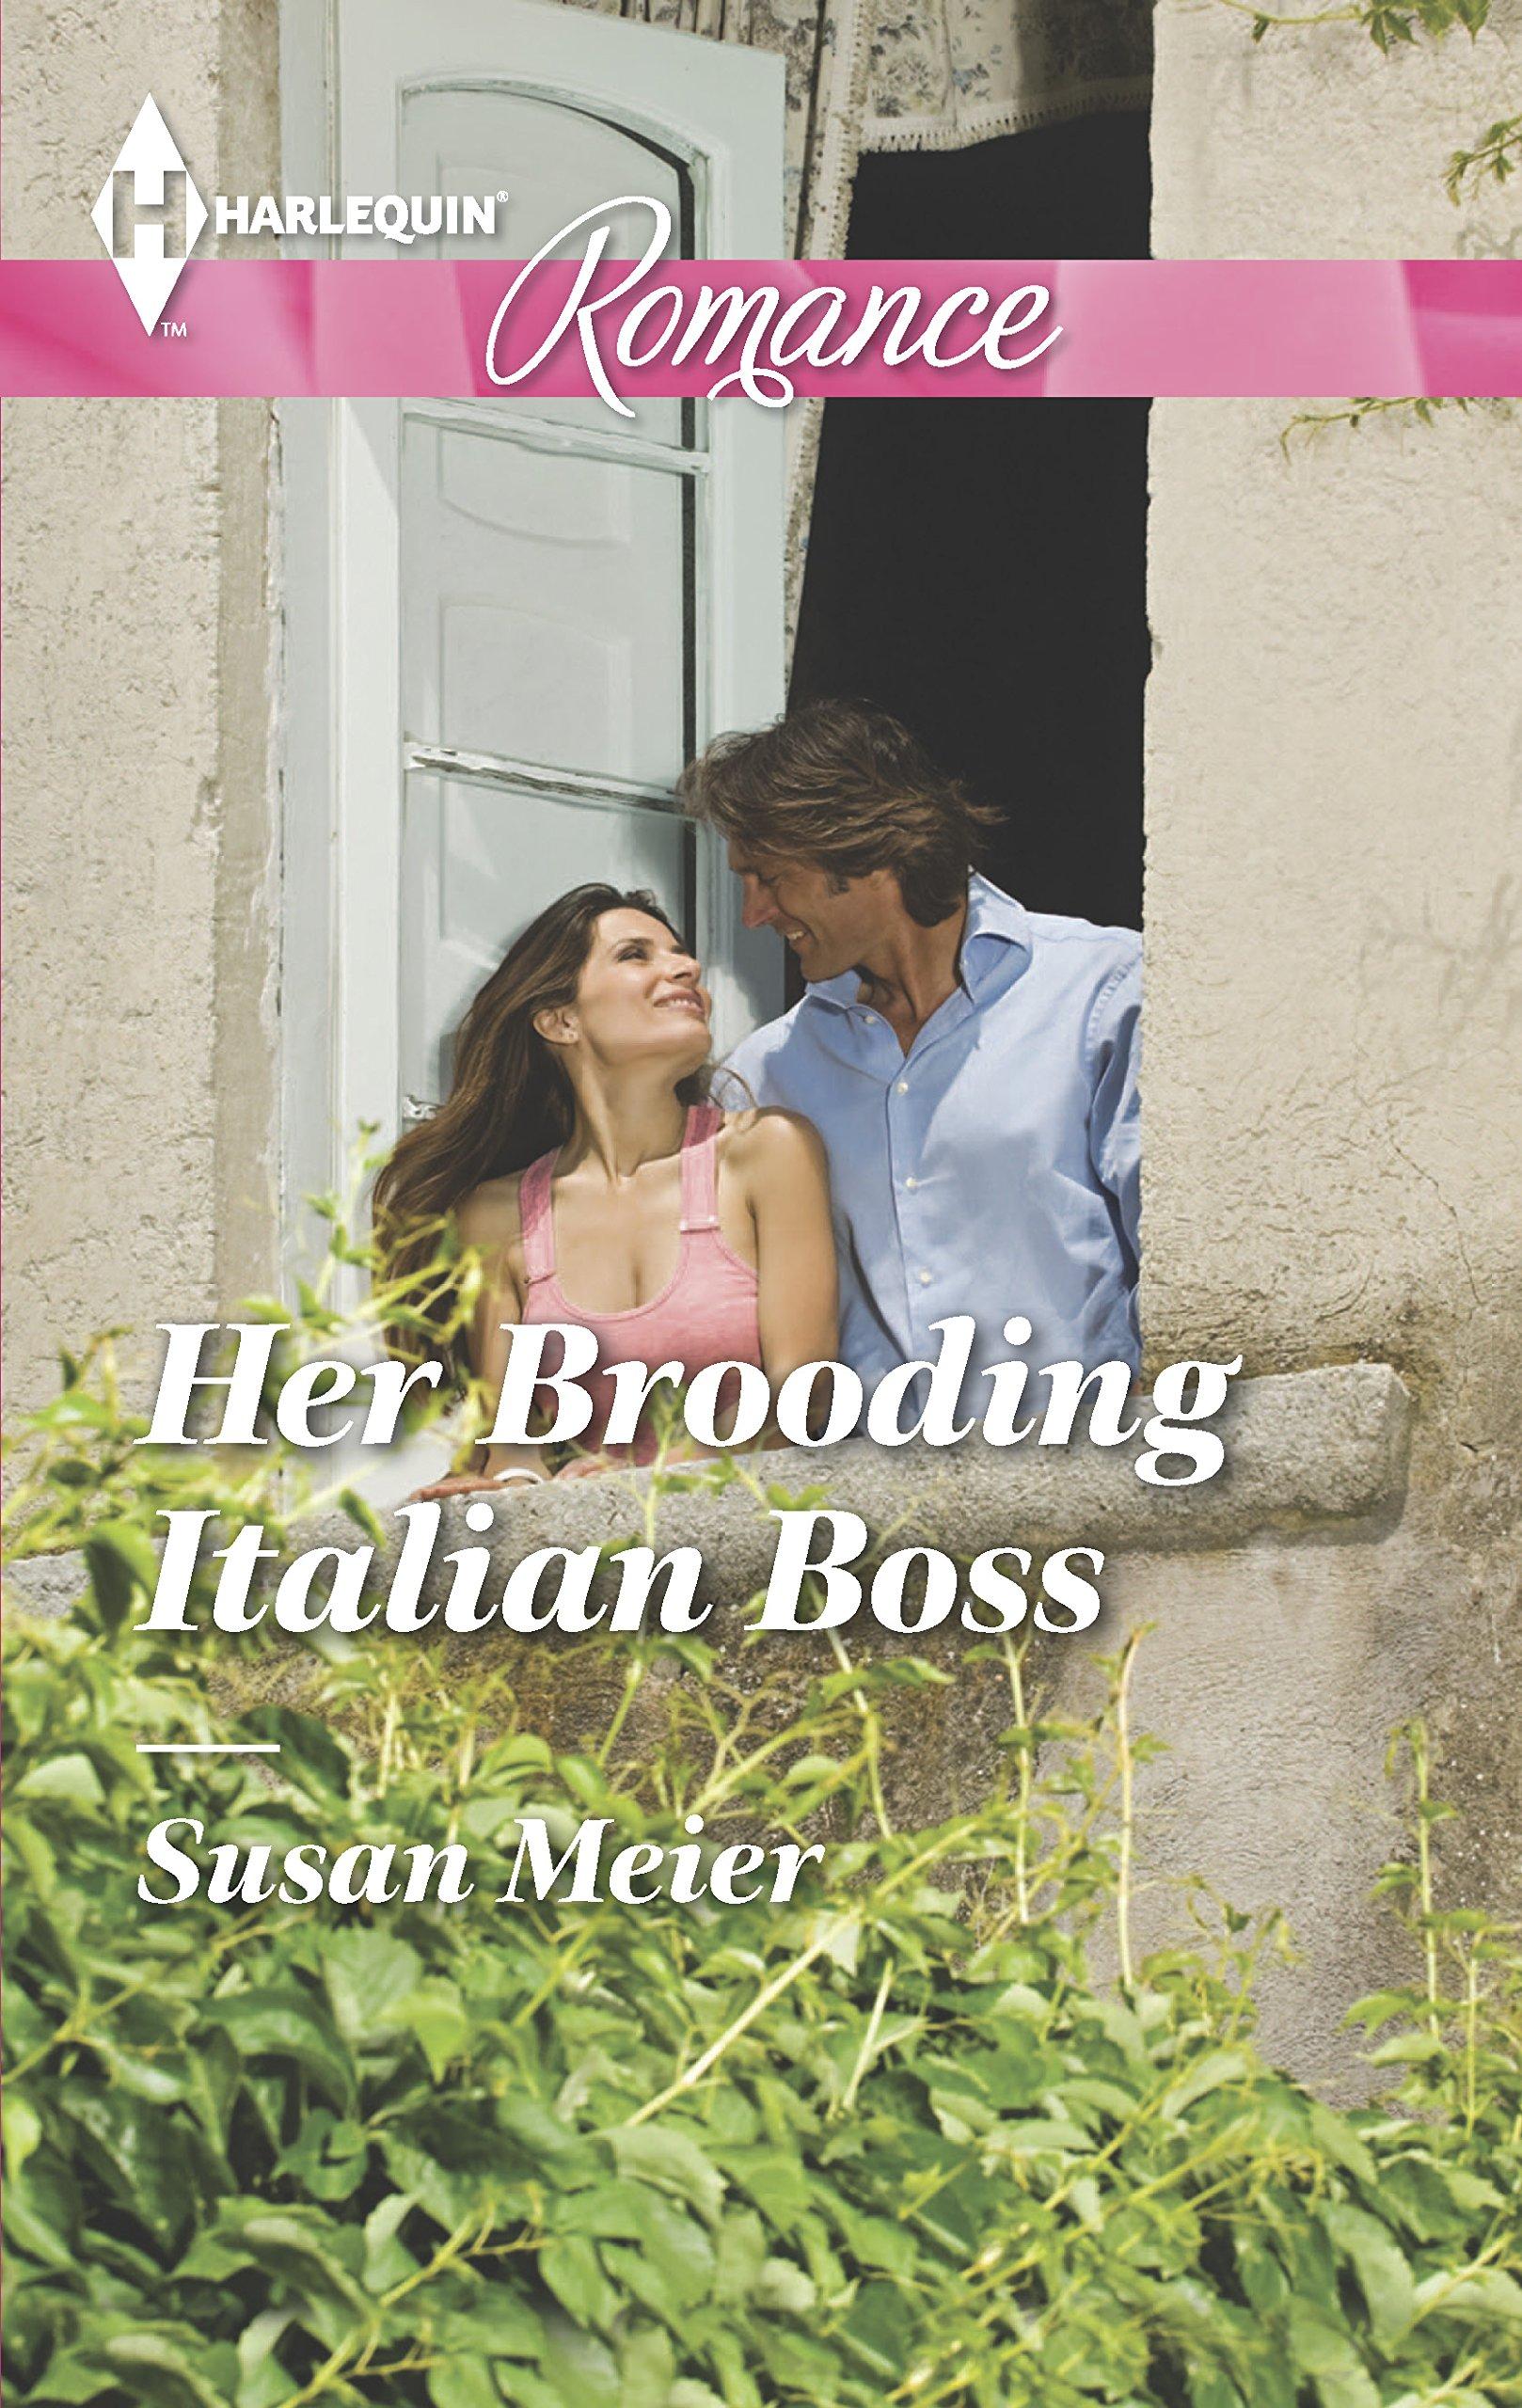 Download Her Brooding Italian Boss (Harlequin Romance) PDF